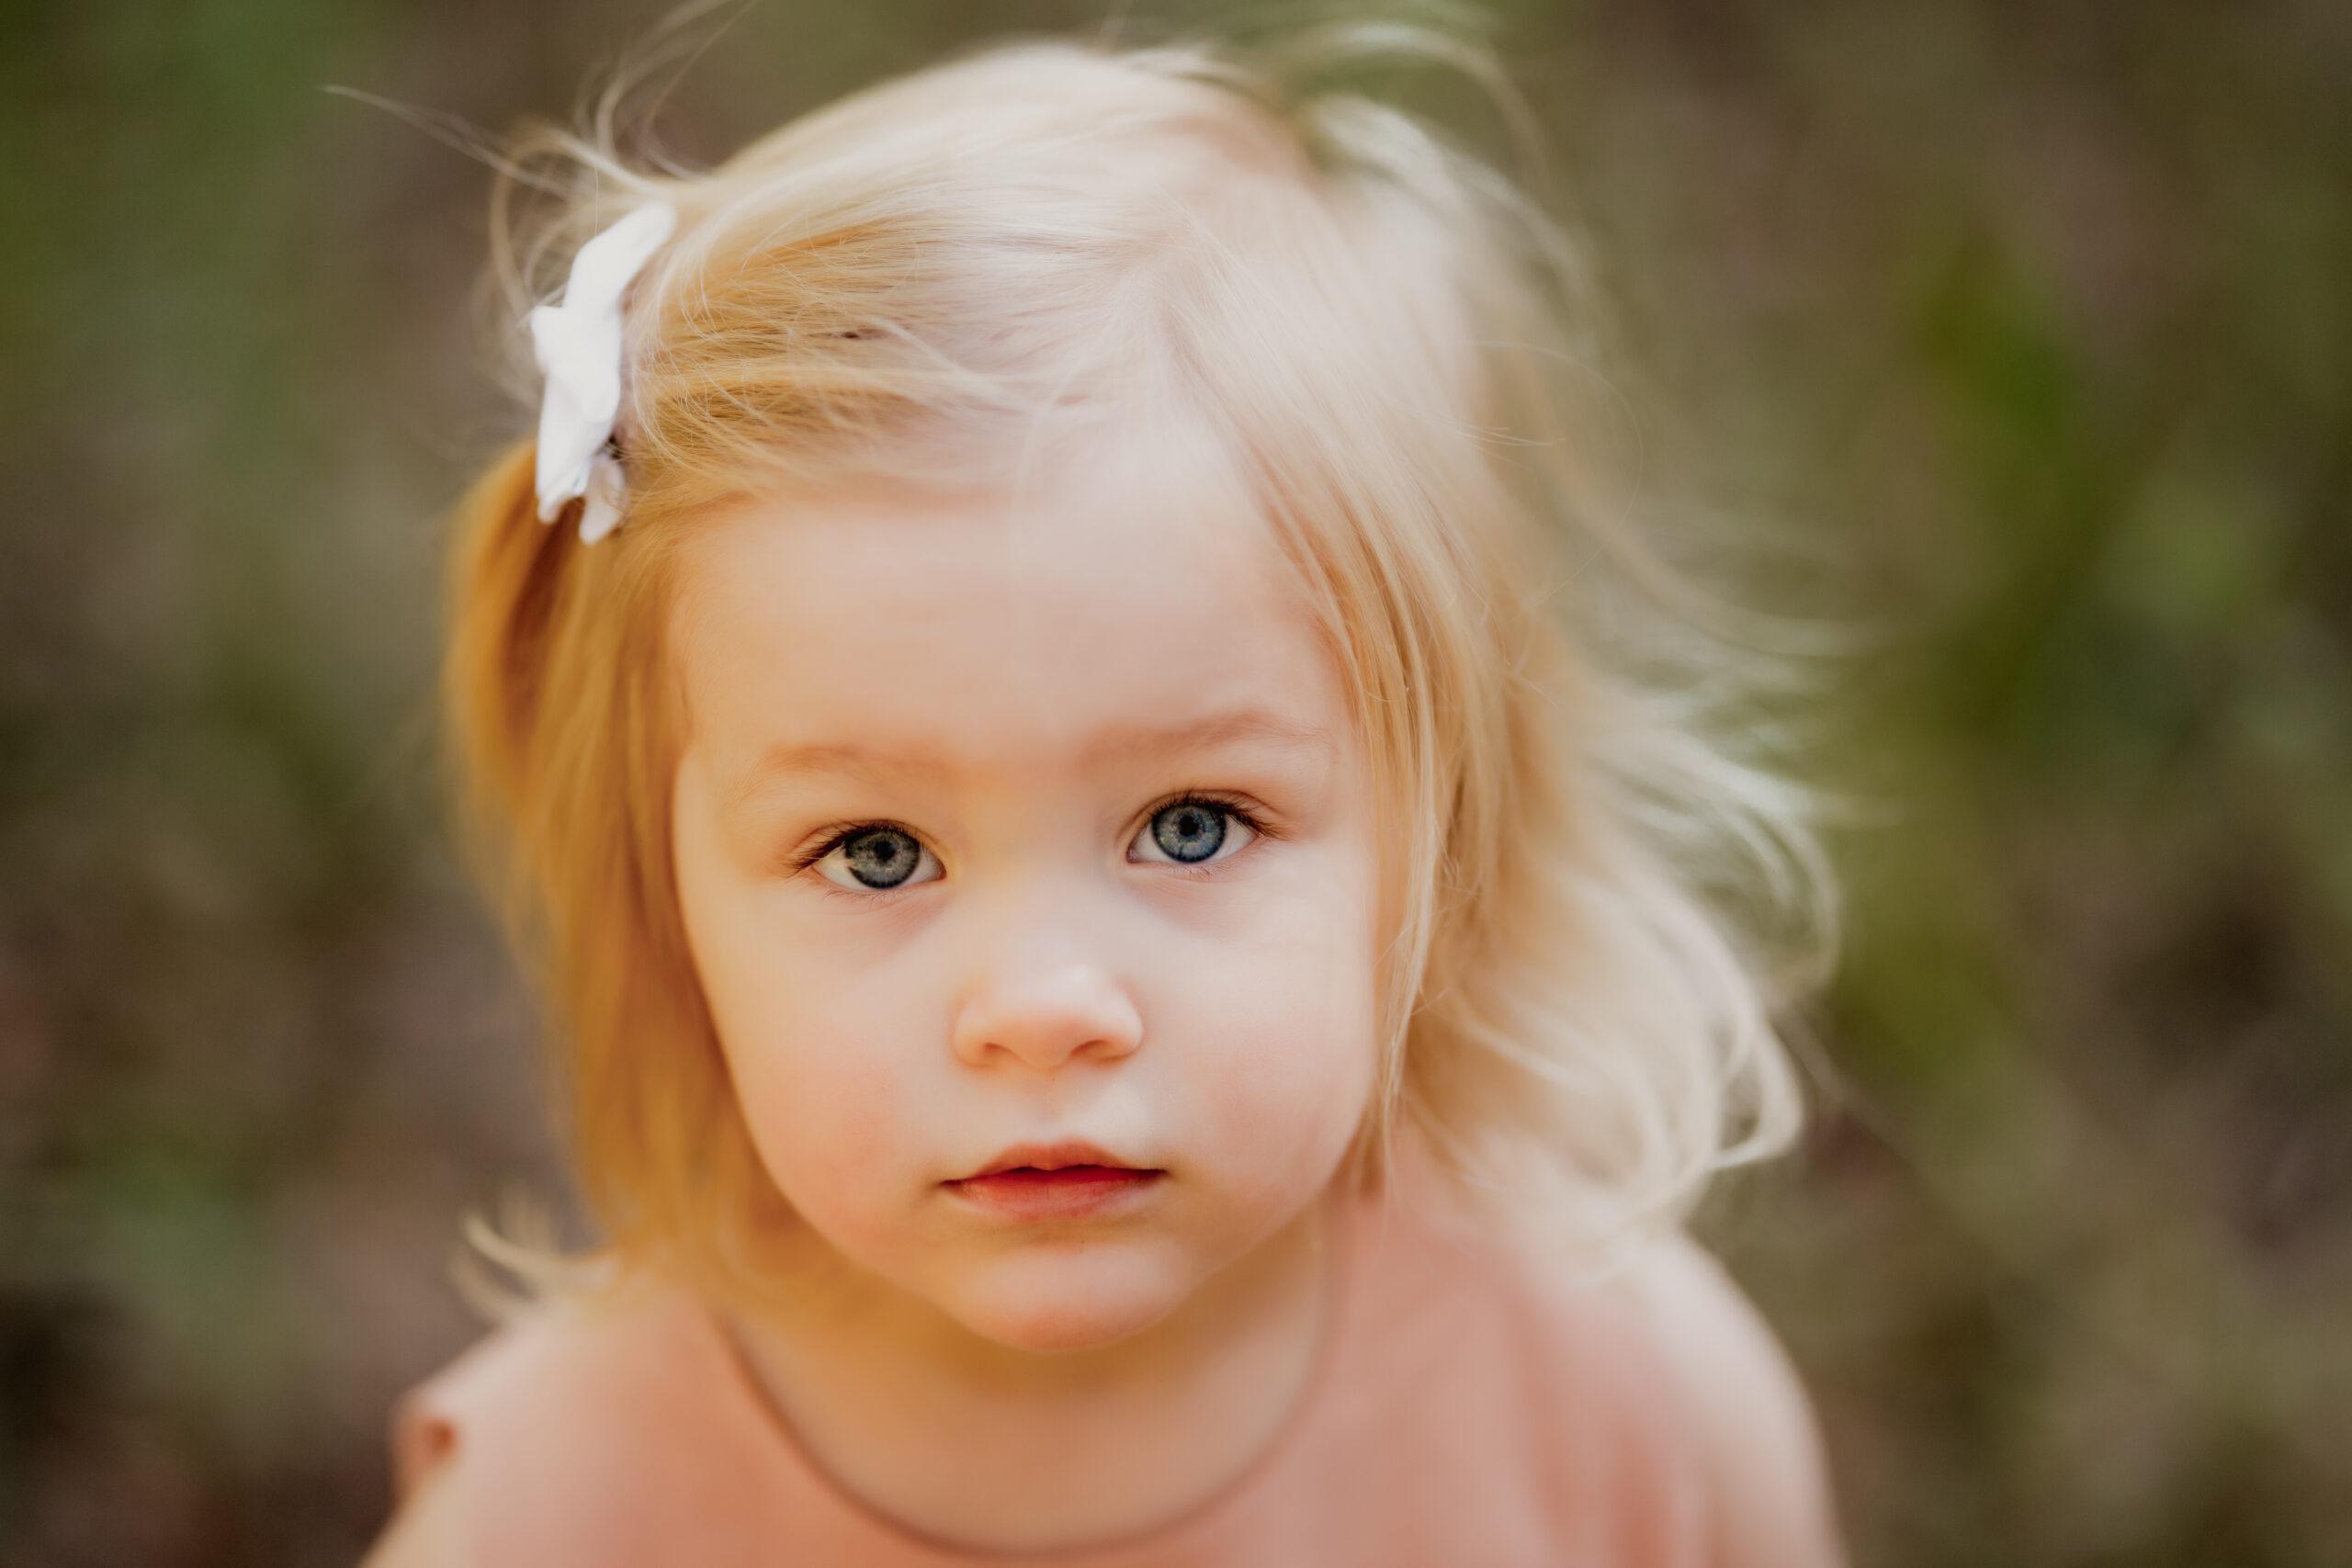 How Family Photos Boost Your Child's Self-Esteem